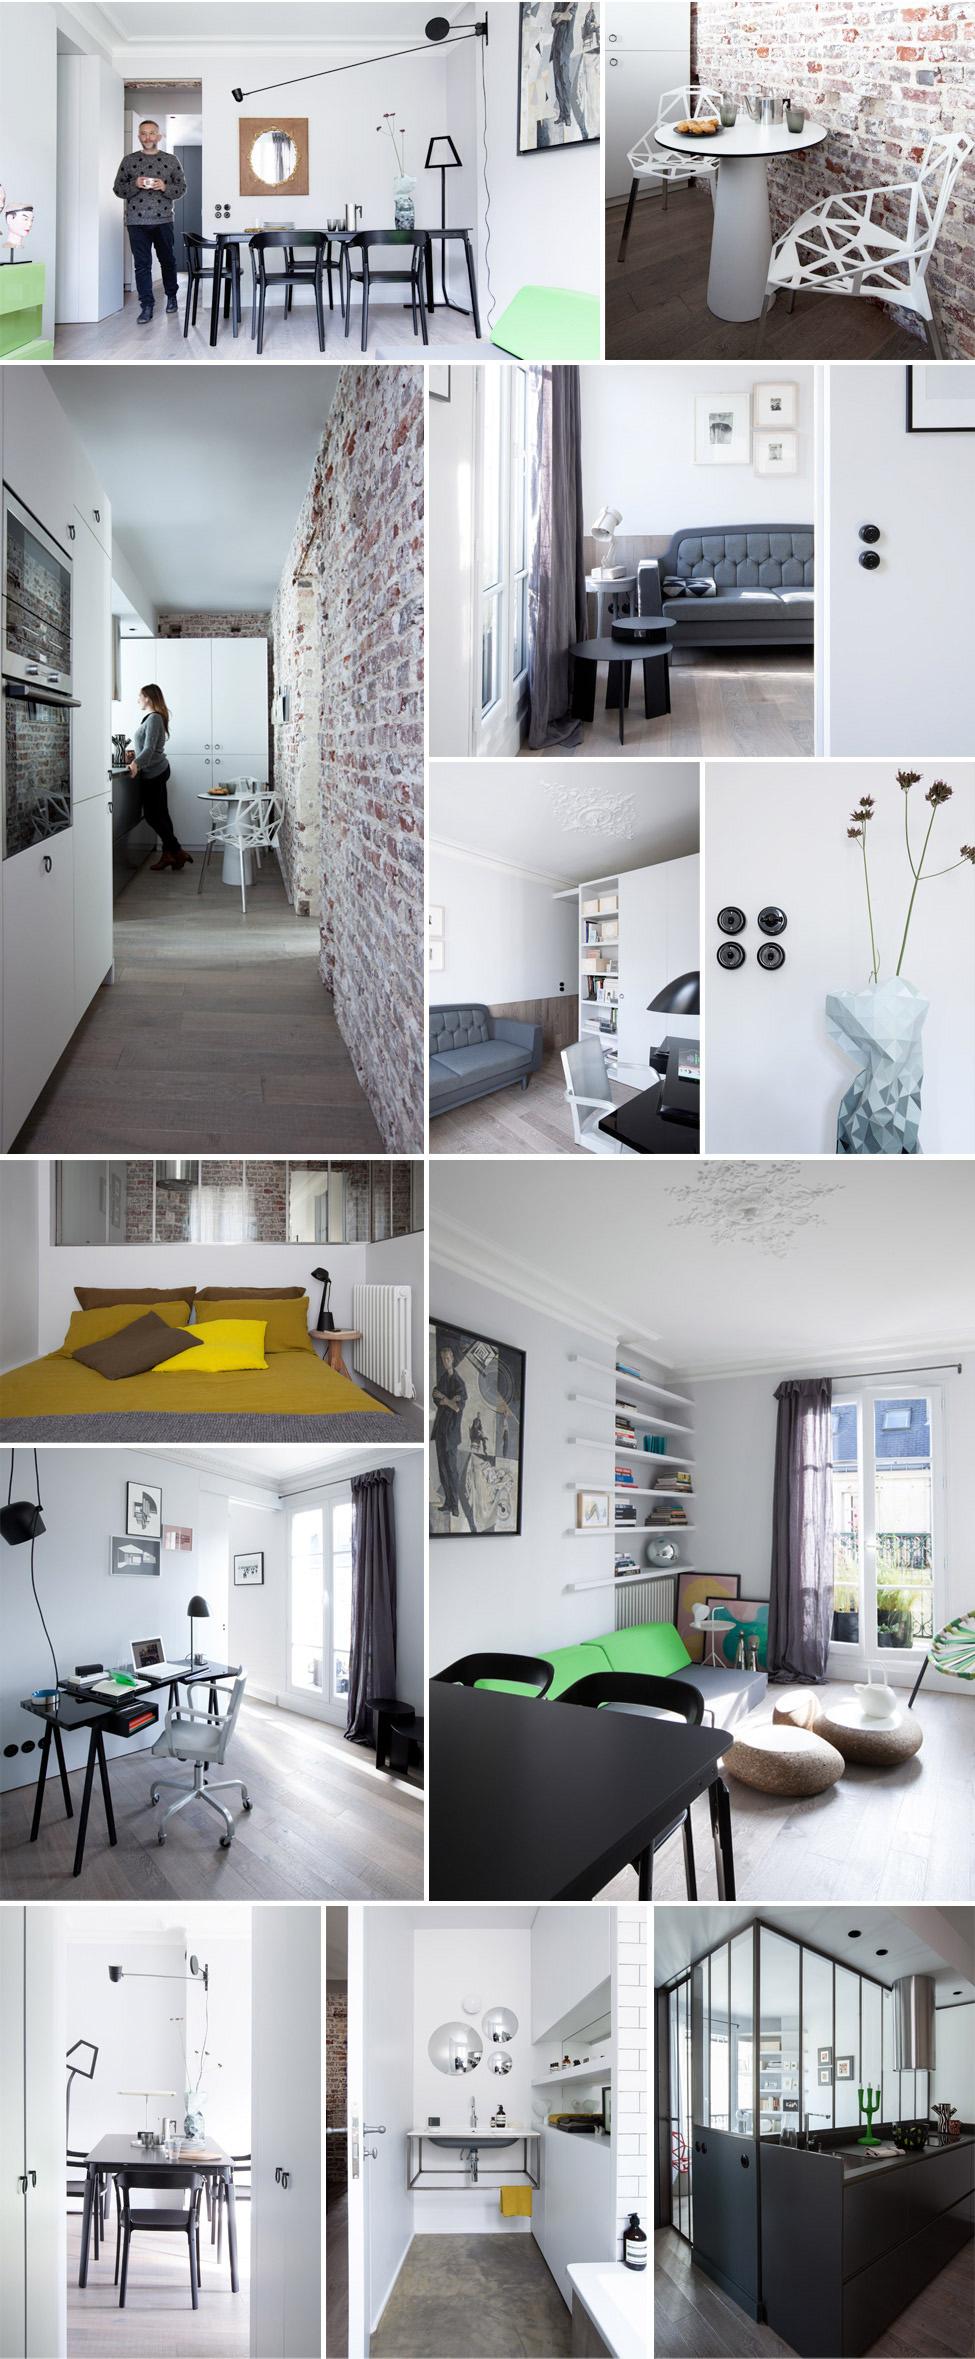 visite priv e guillaume petit. Black Bedroom Furniture Sets. Home Design Ideas